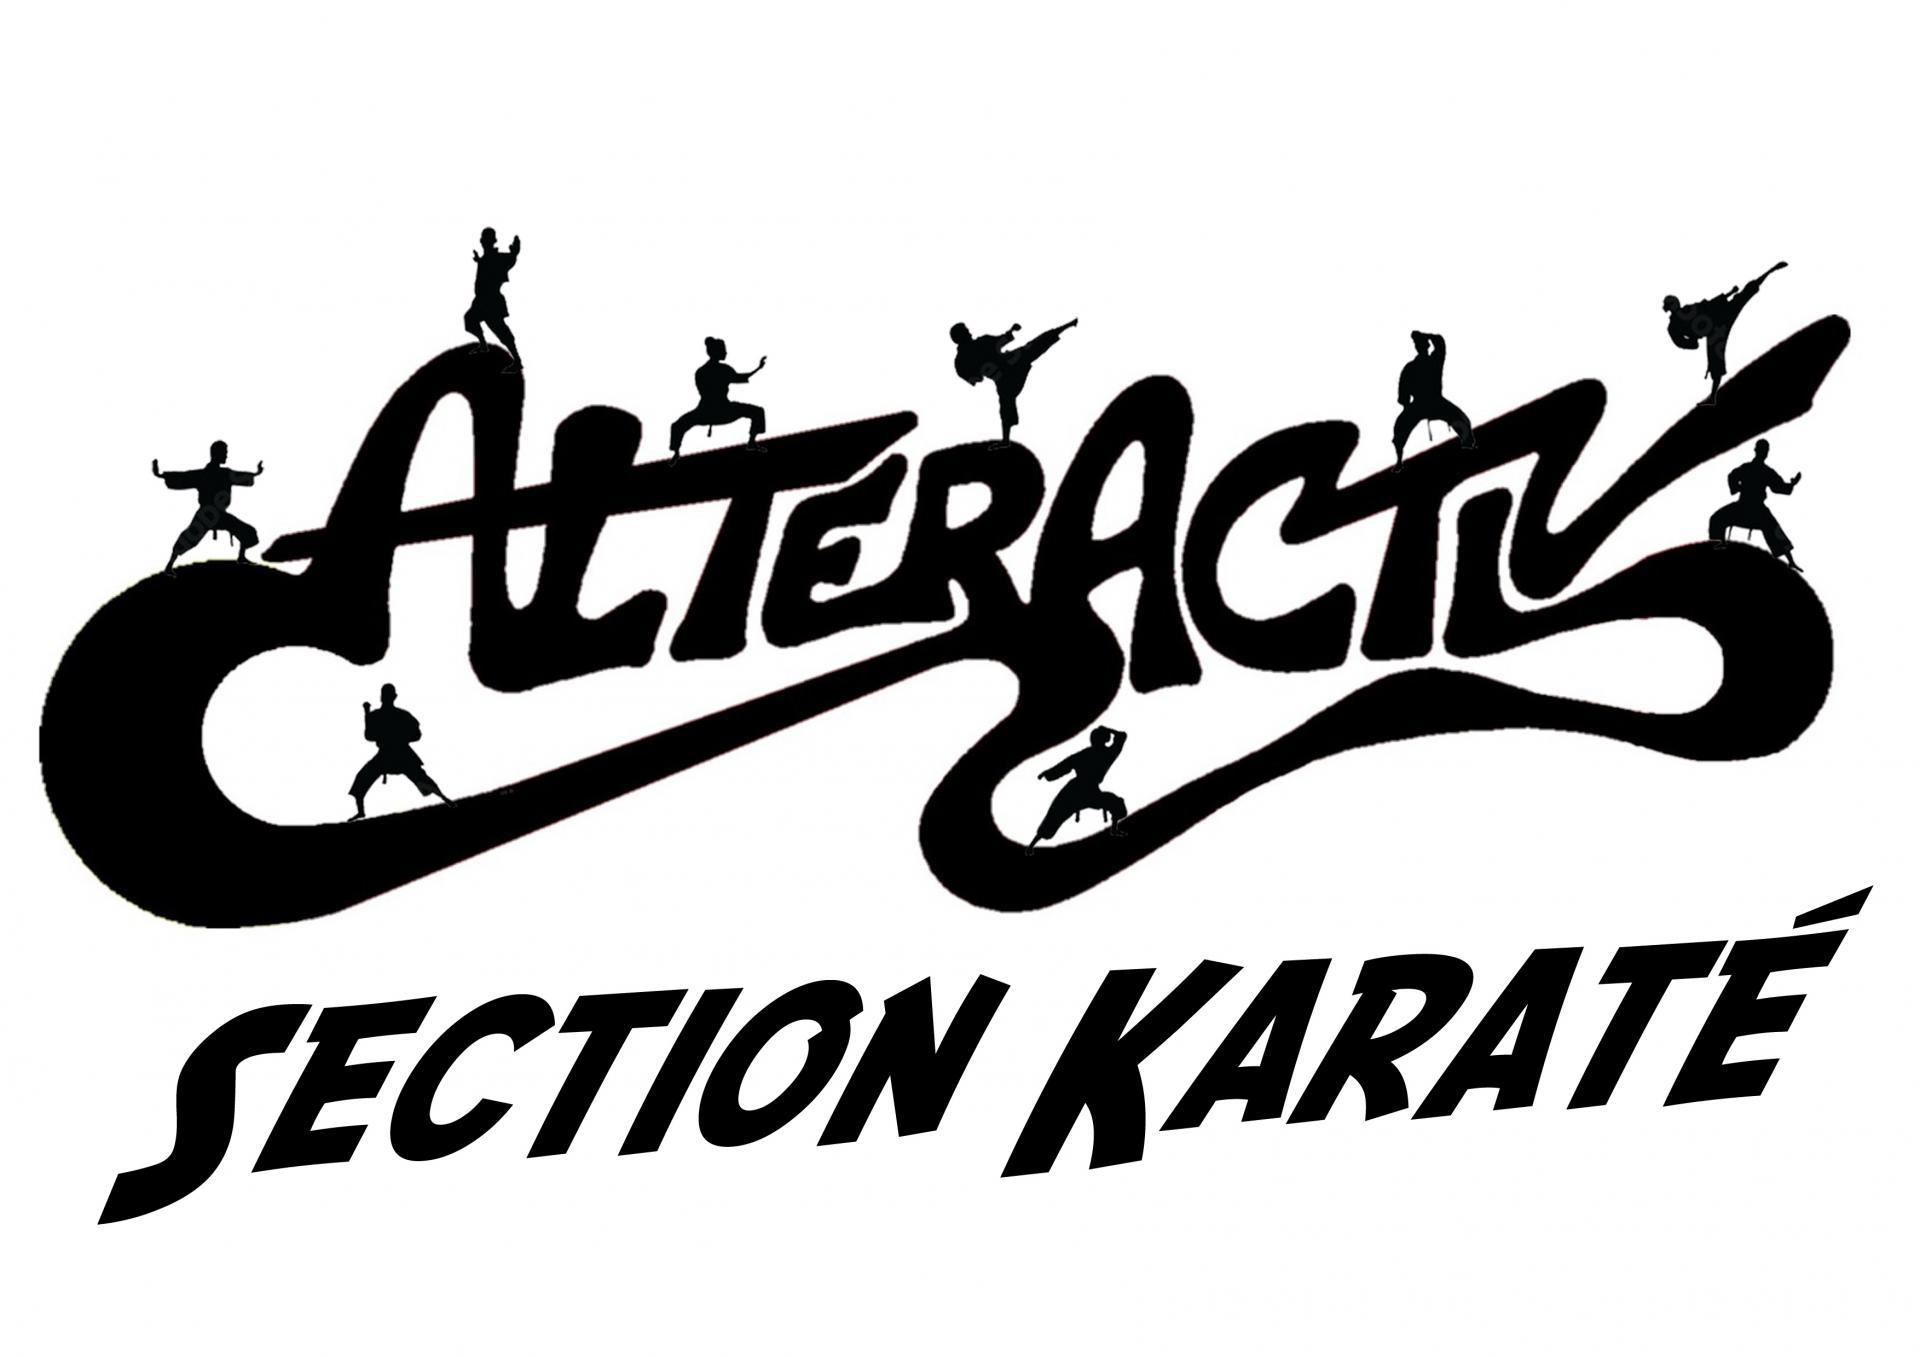 Alteractiv section karate logo